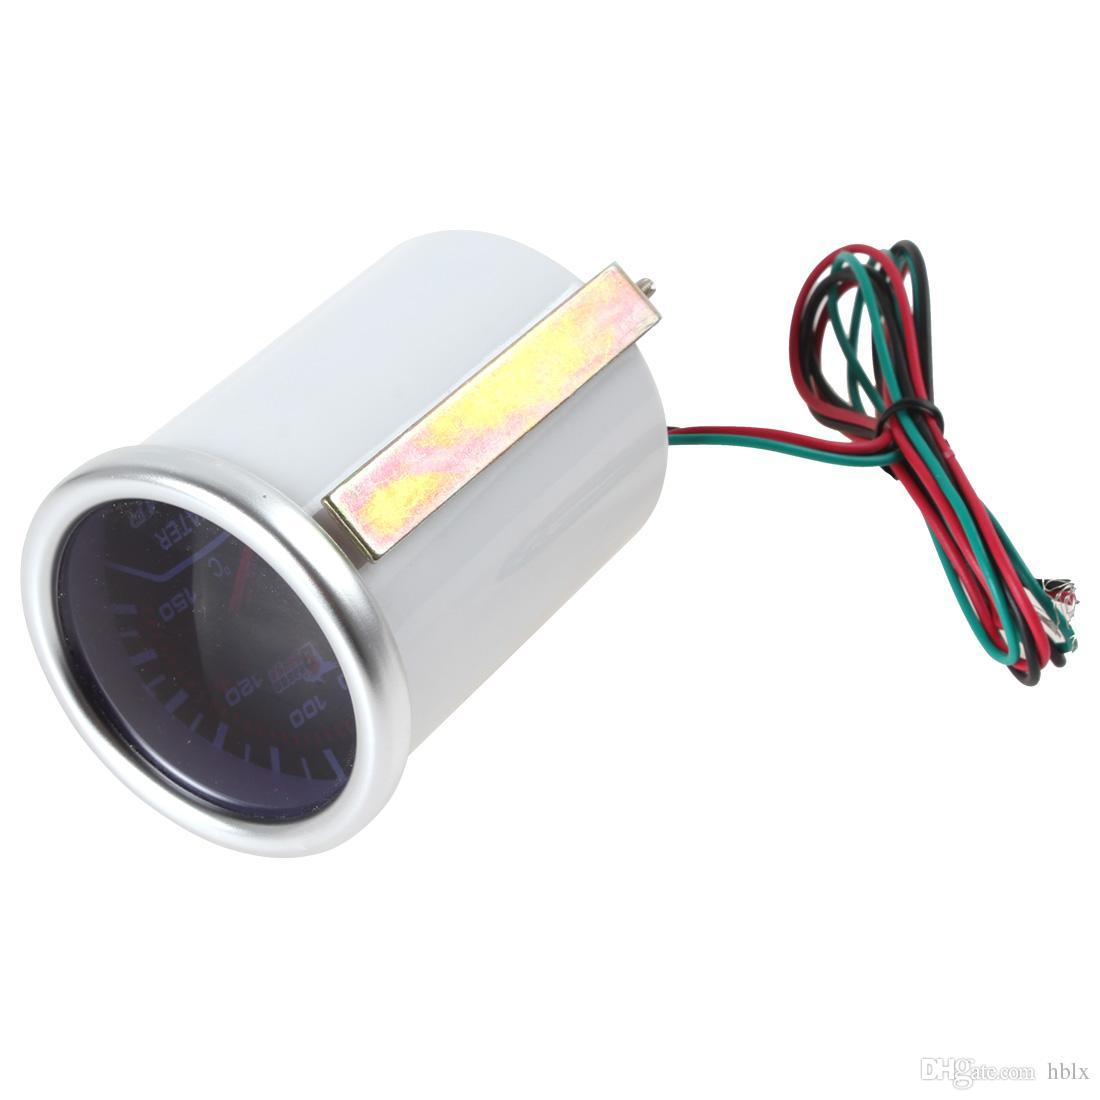 2 Inch 52mm Car Universal Smoke Len LED Water Temperature Gauge Meter CEC_503